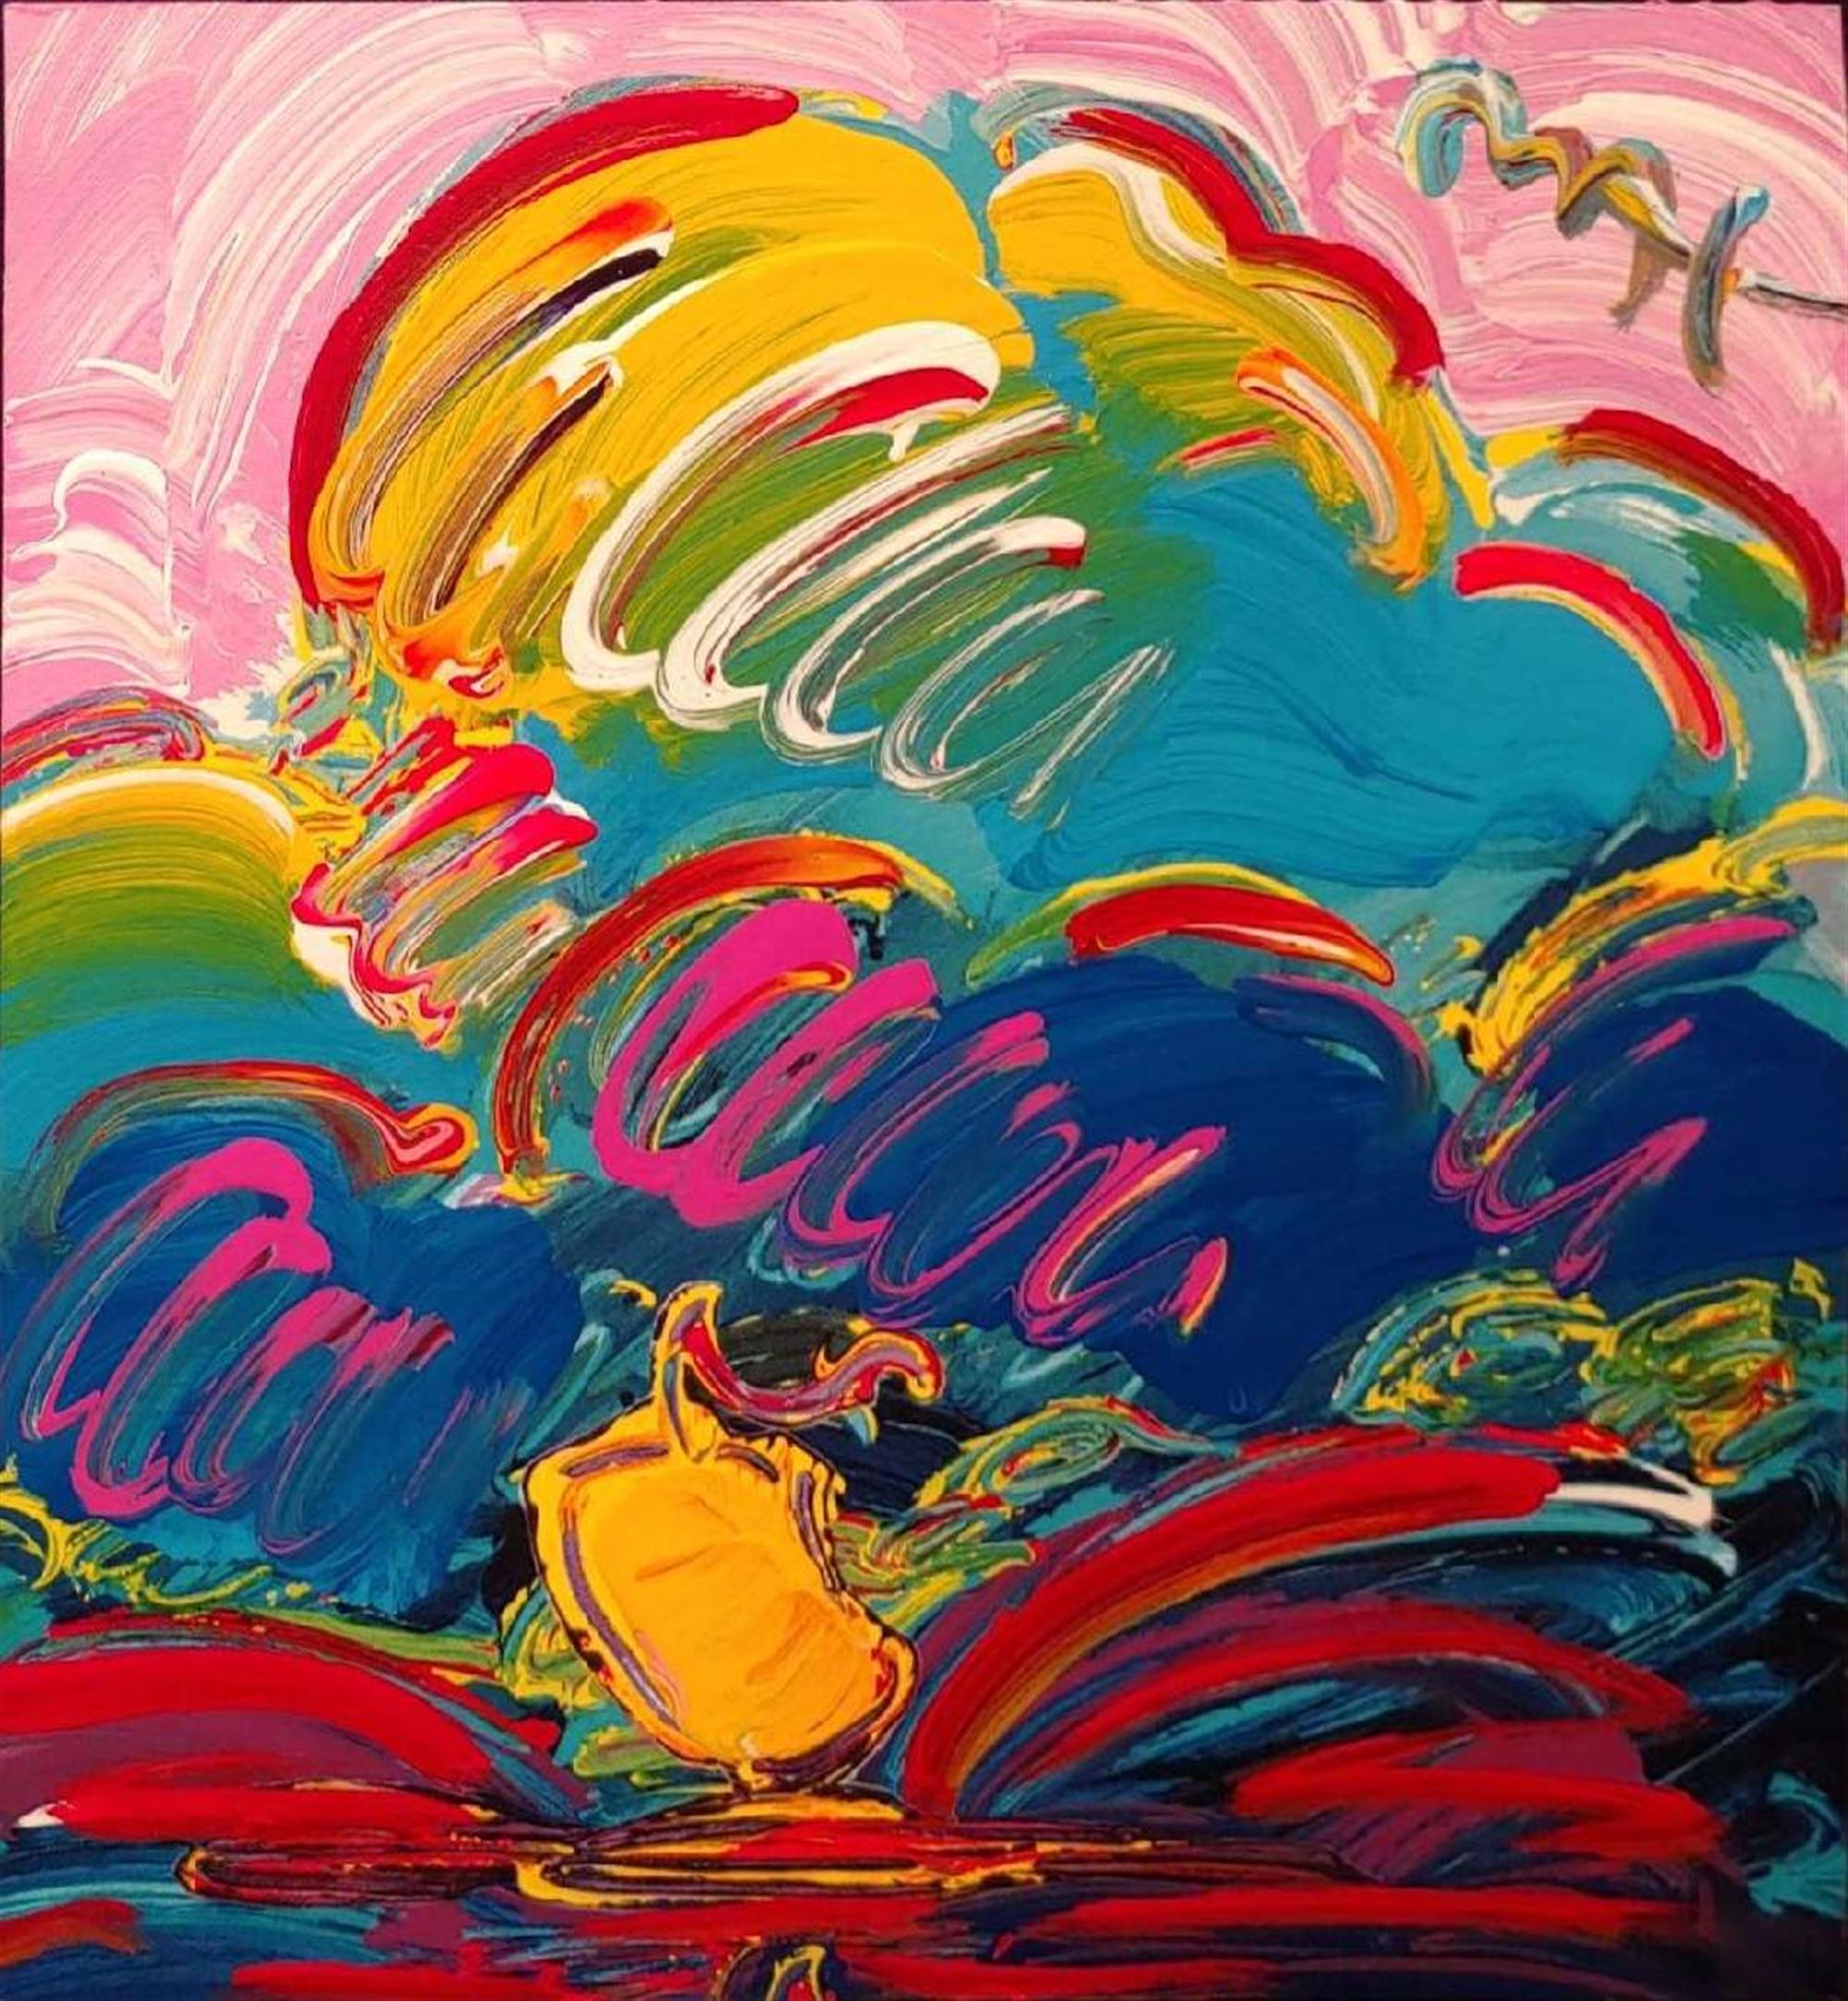 RETRO: SAMURAI SAIL by Peter Max